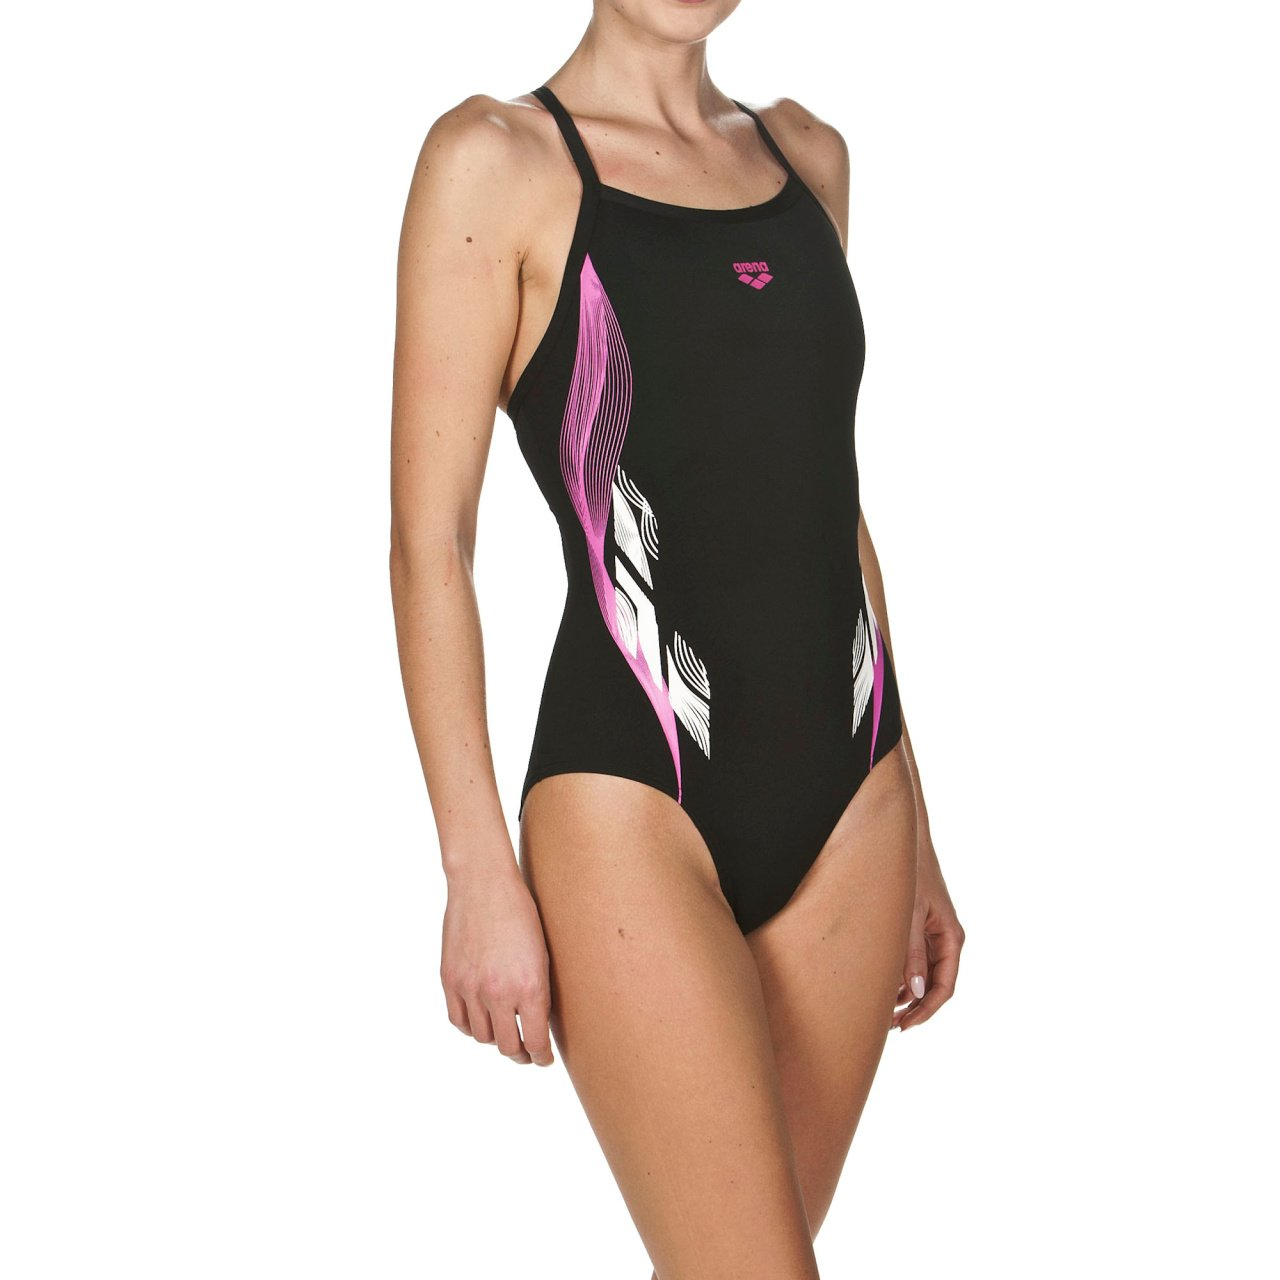 ARENA Womens Sports Swimsuit Fingerprint Fast Drying, UV Protection UPF 50+, Chlorine Resistant, Adjustable